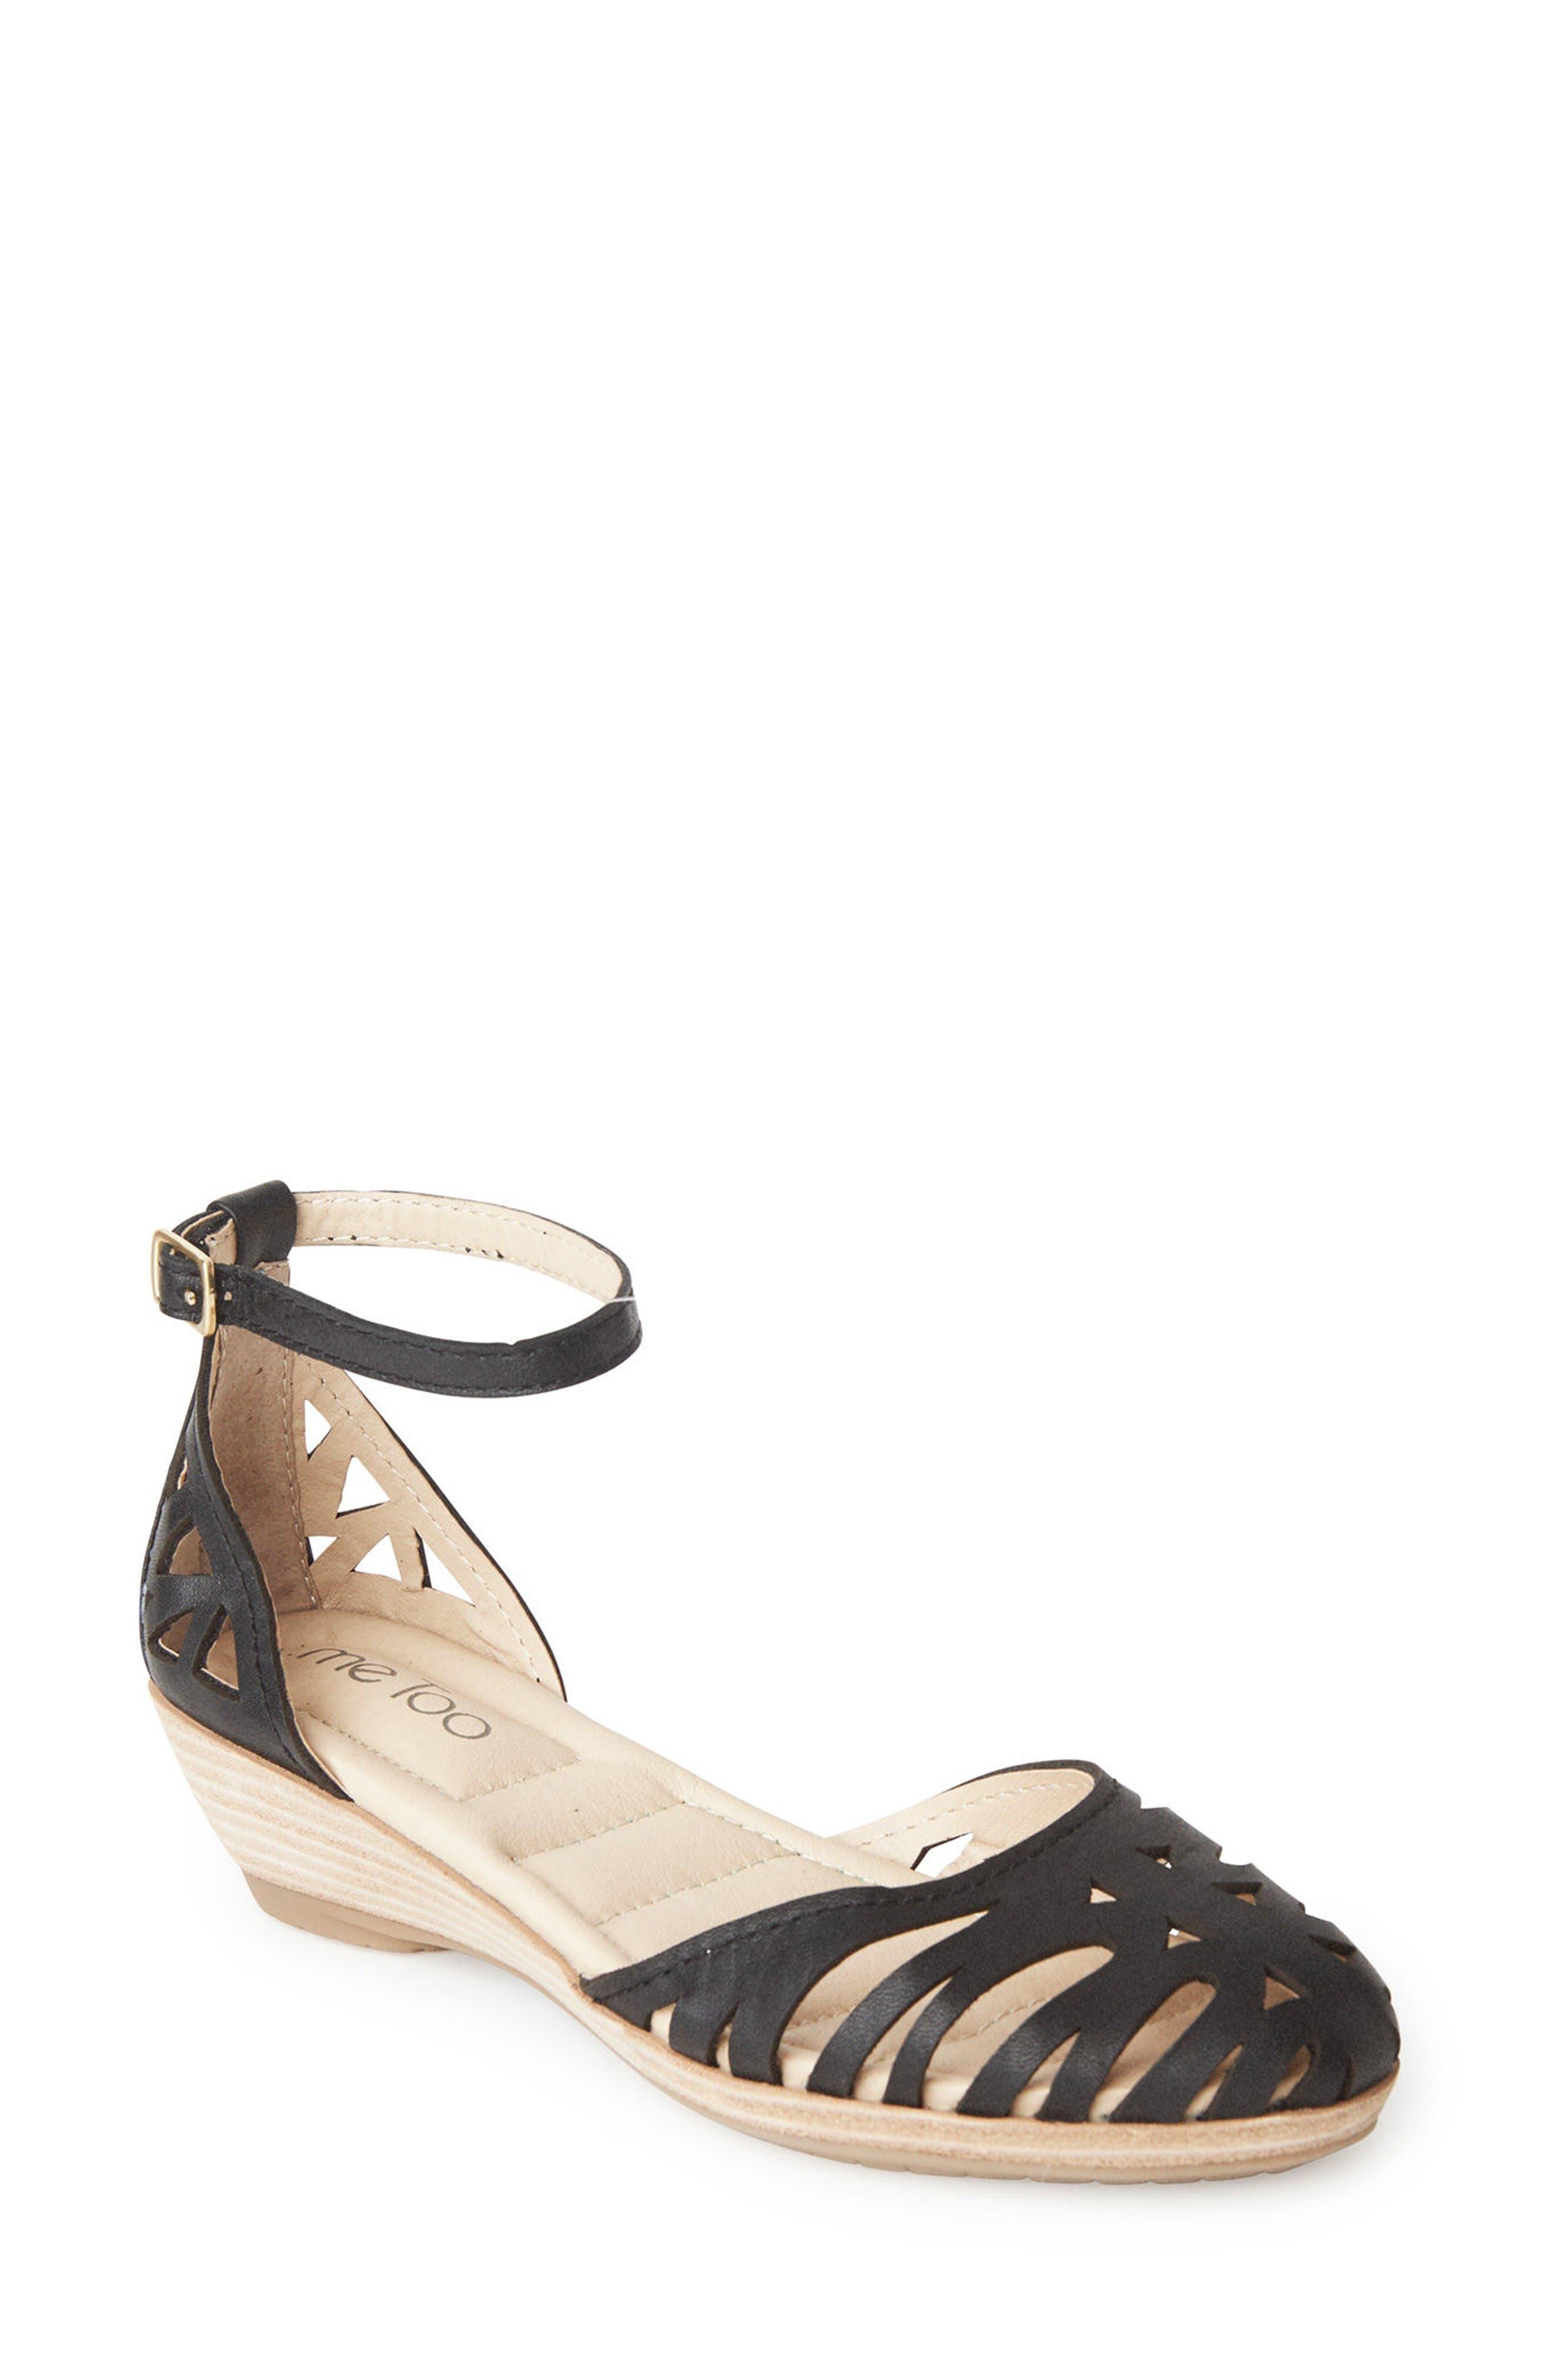 Main Image - Me Too Nalani Ankle Strap Sandal (Women)